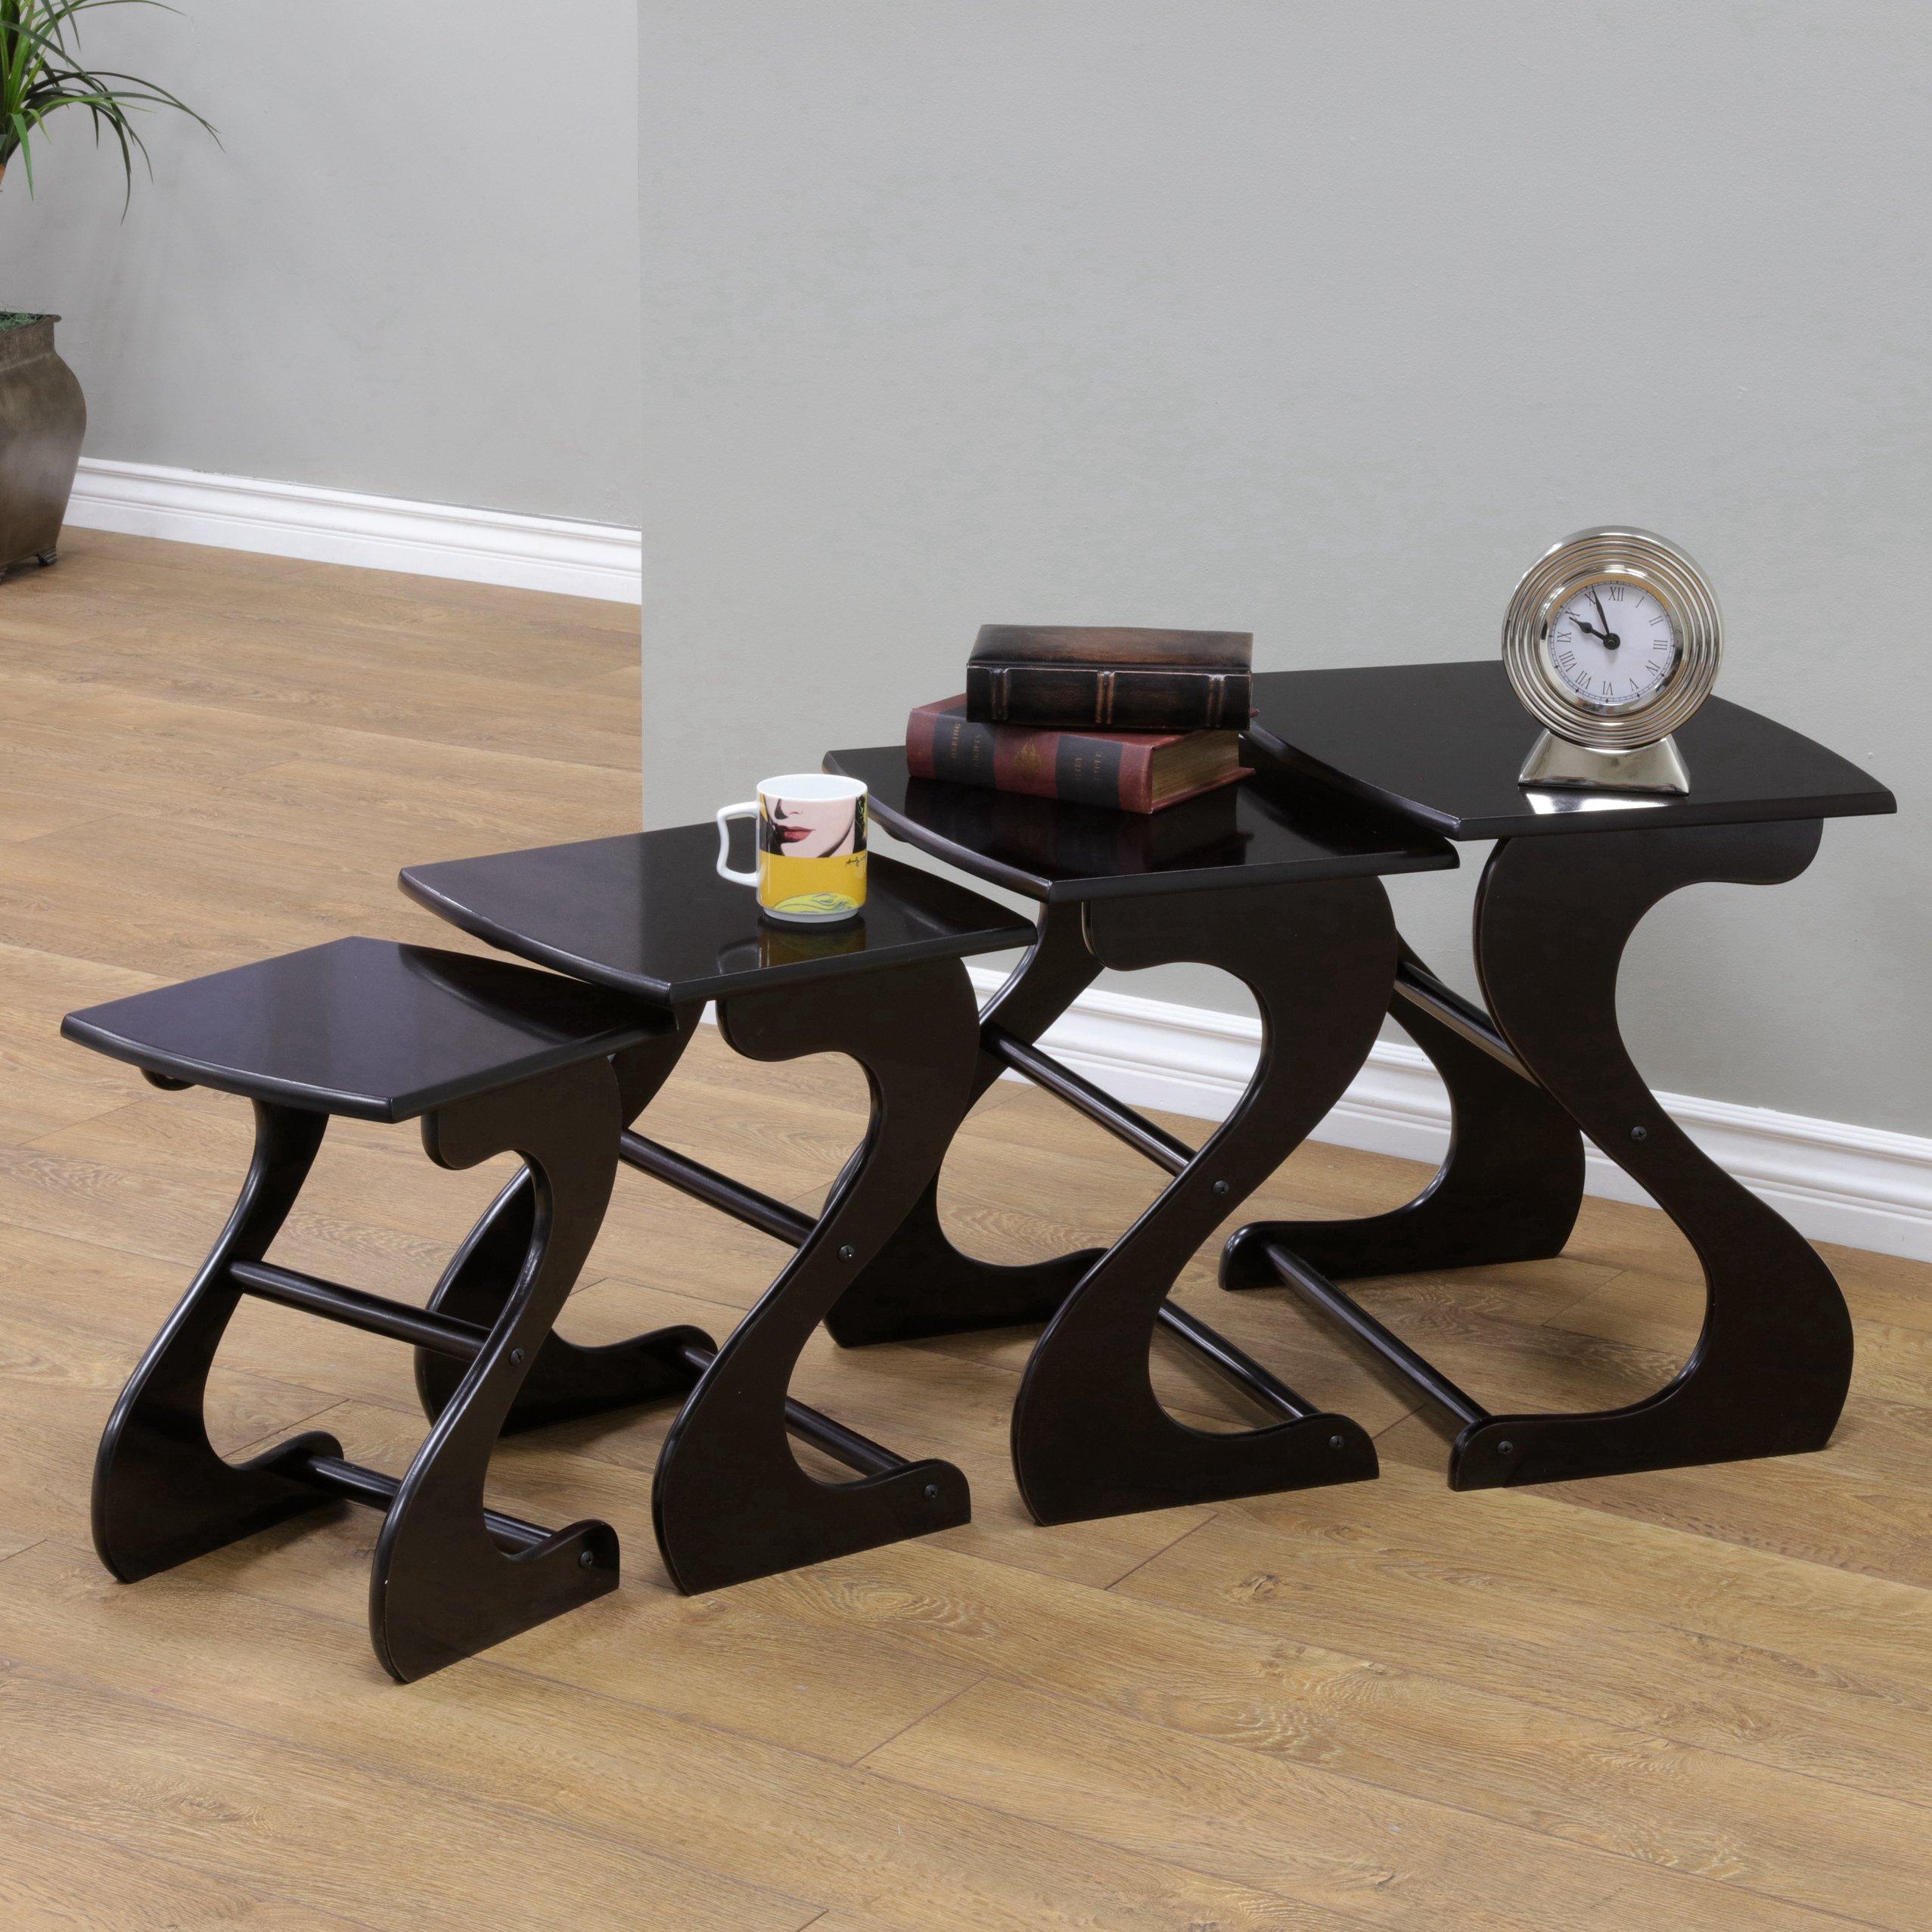 Frenchi Home Furnishing Nesting Tables (Set of 4)